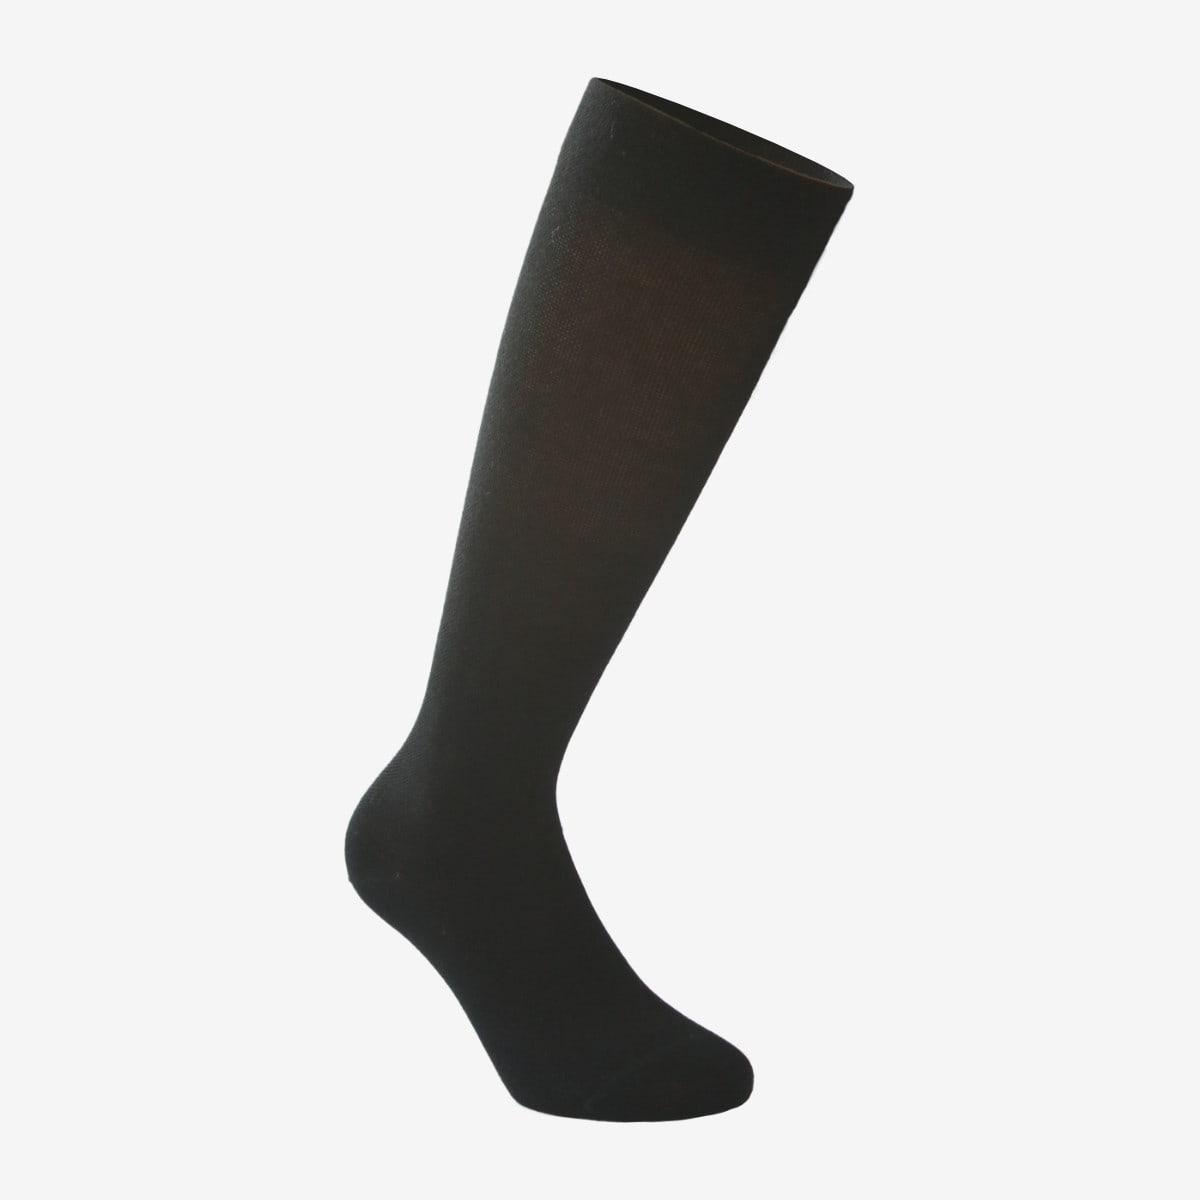 Preventivne kompresivne čarape